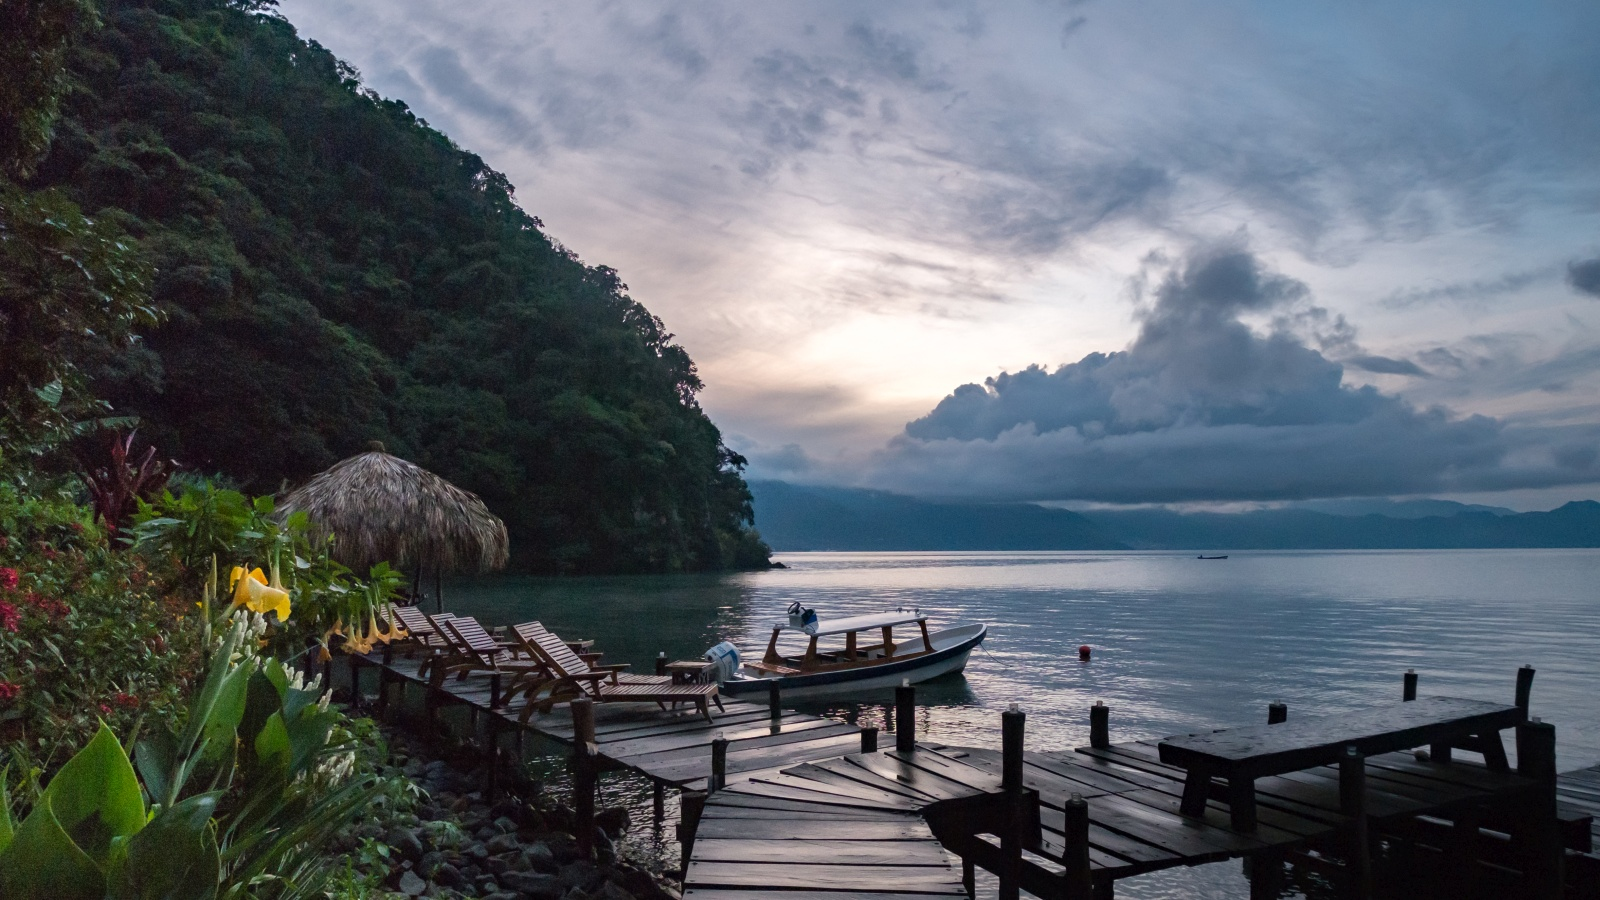 Picture of the dock at Lake Atitlan